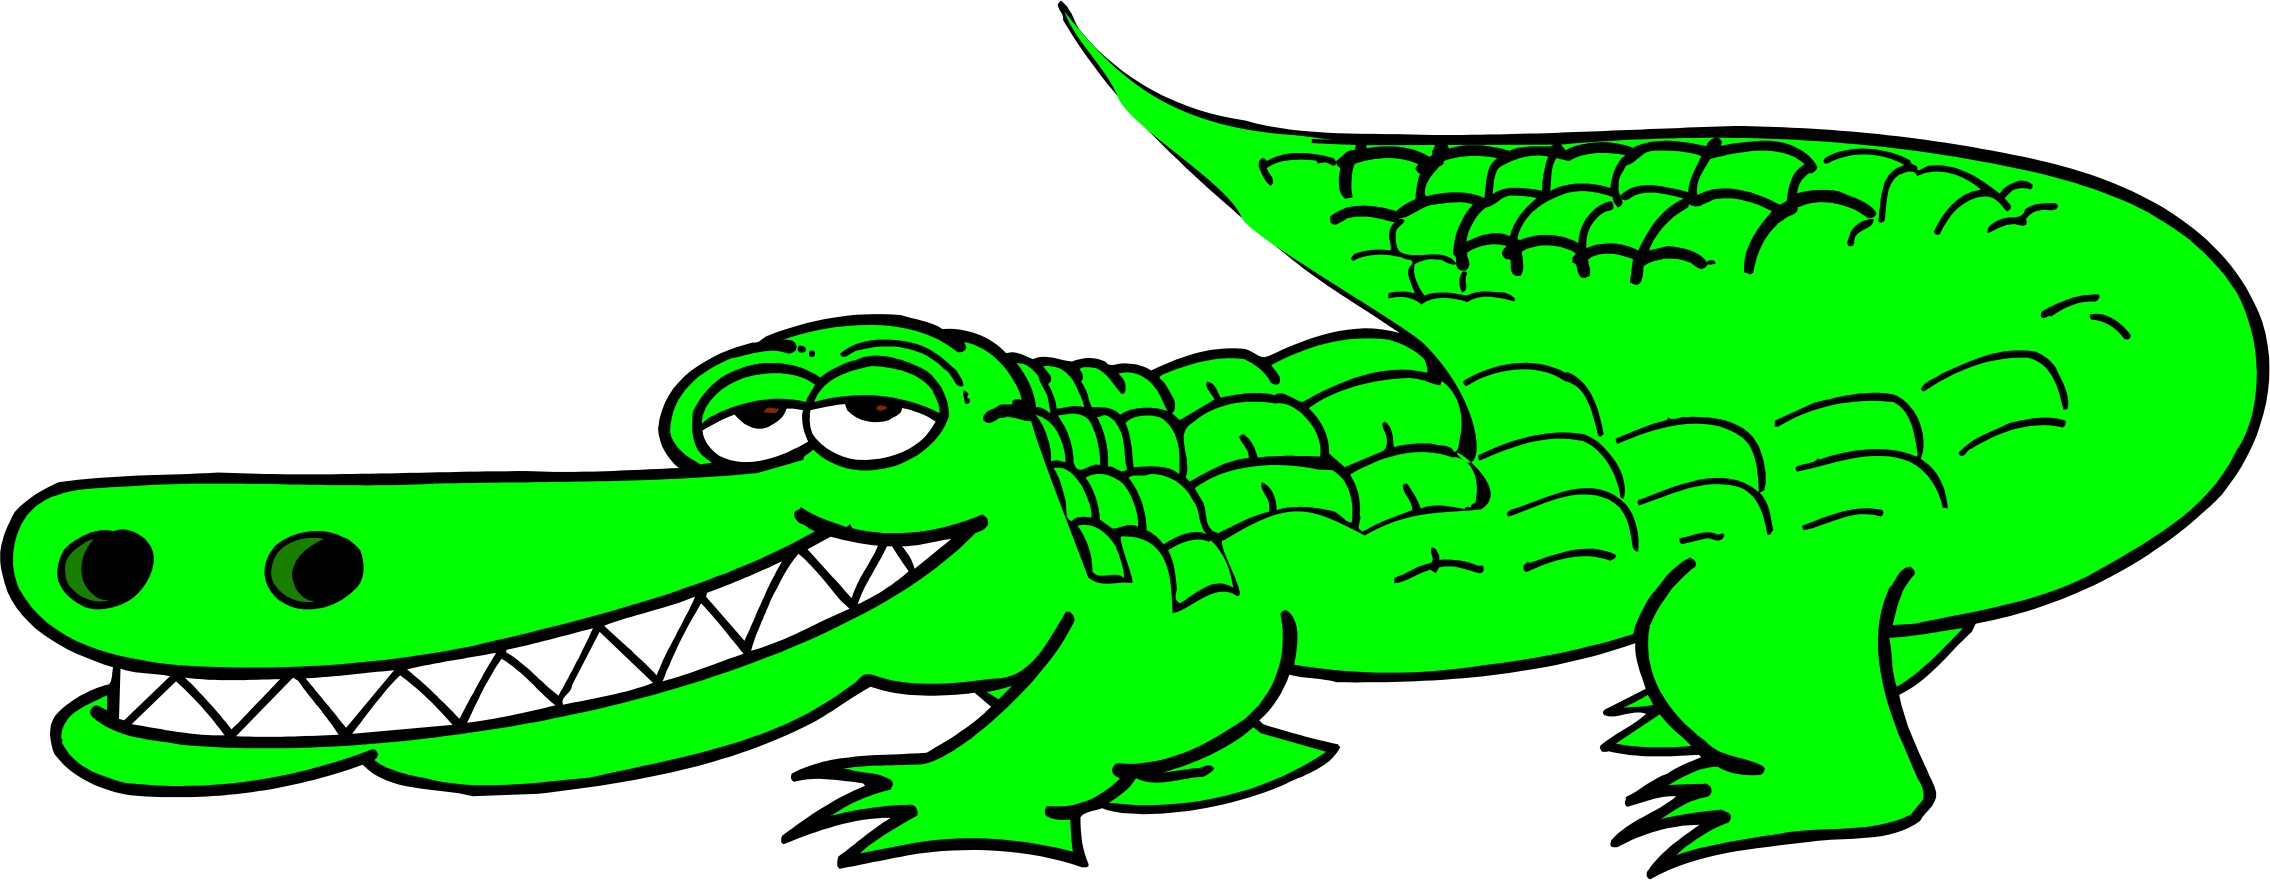 Alligator Rivers  Wikipedia